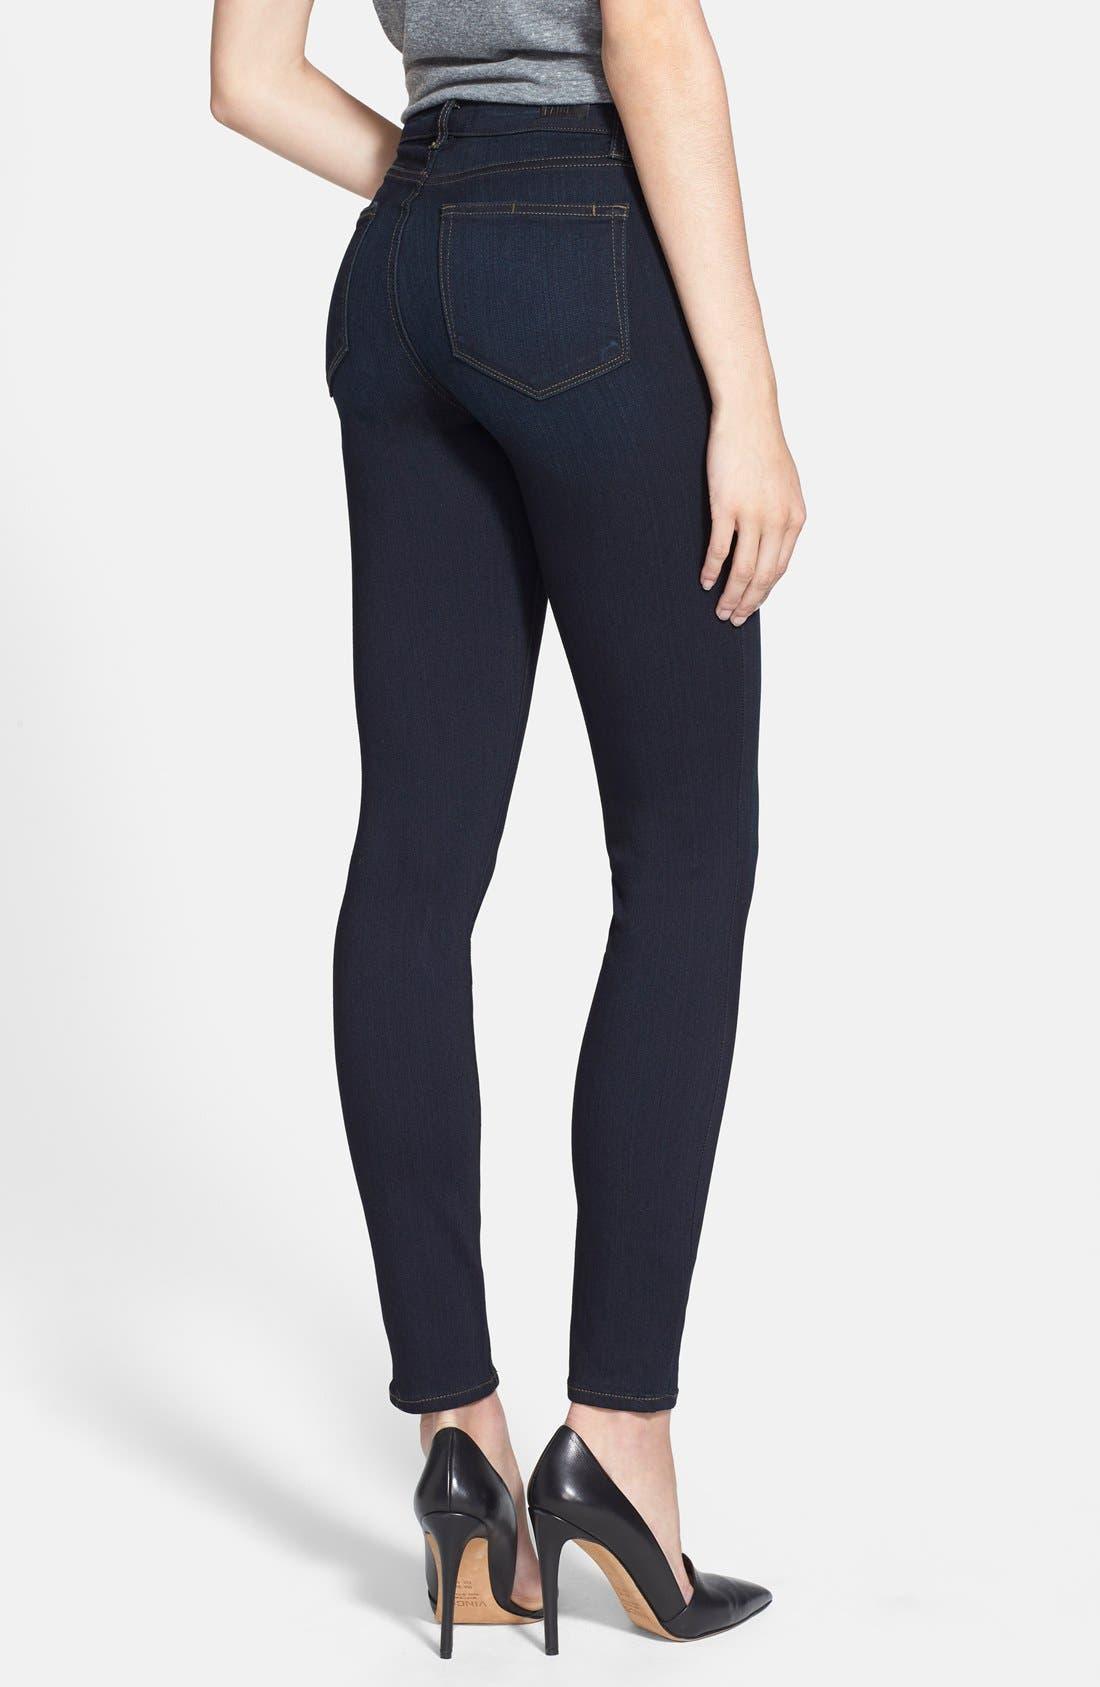 Transcend - Hoxton High Waist Ultra Skinny Jeans,                             Alternate thumbnail 4, color,                             MONA